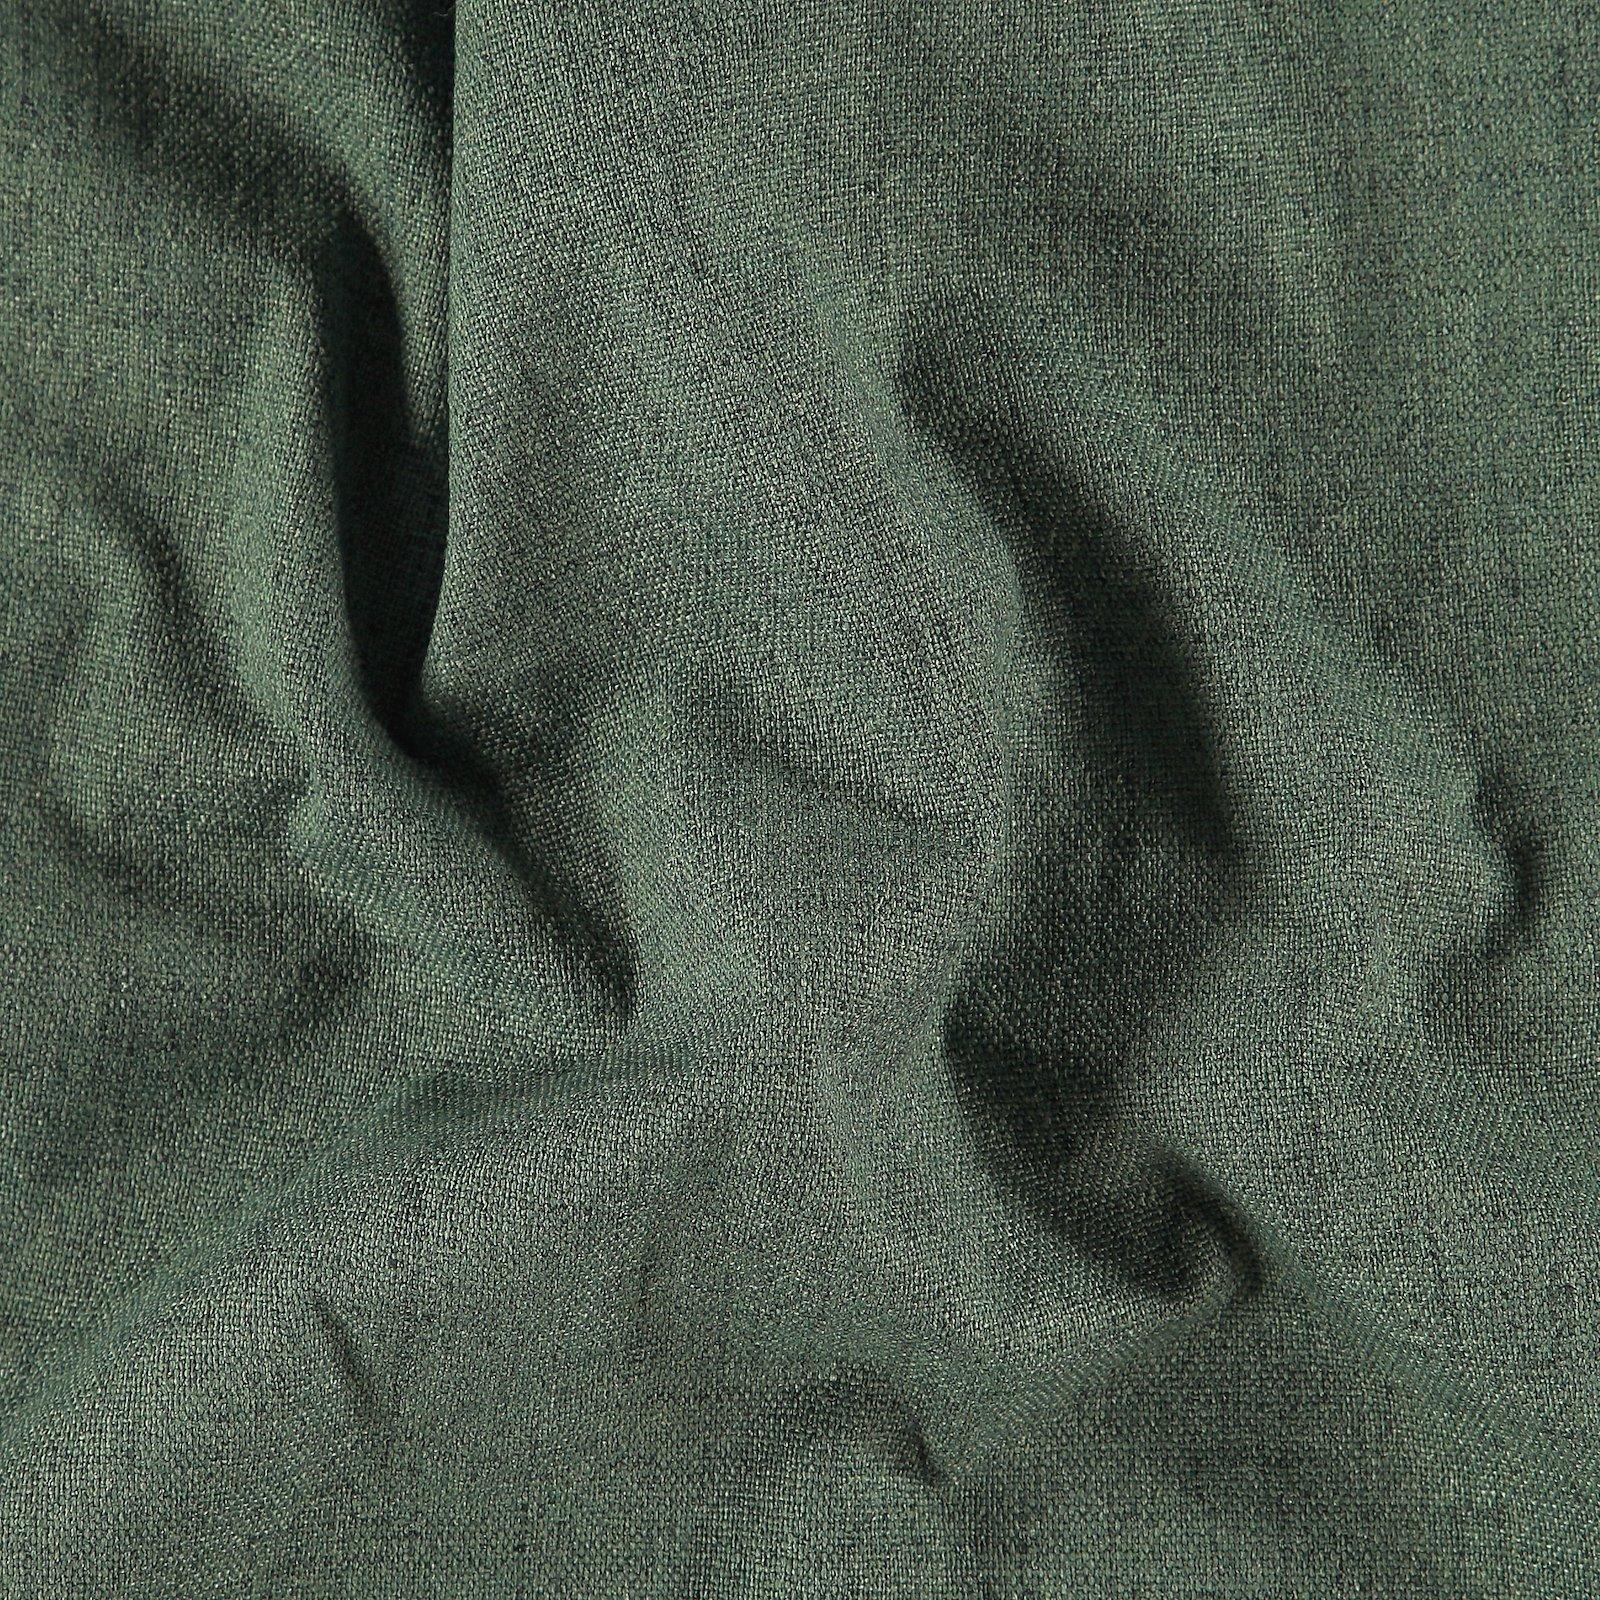 Upholstery fabric dark green w/backing